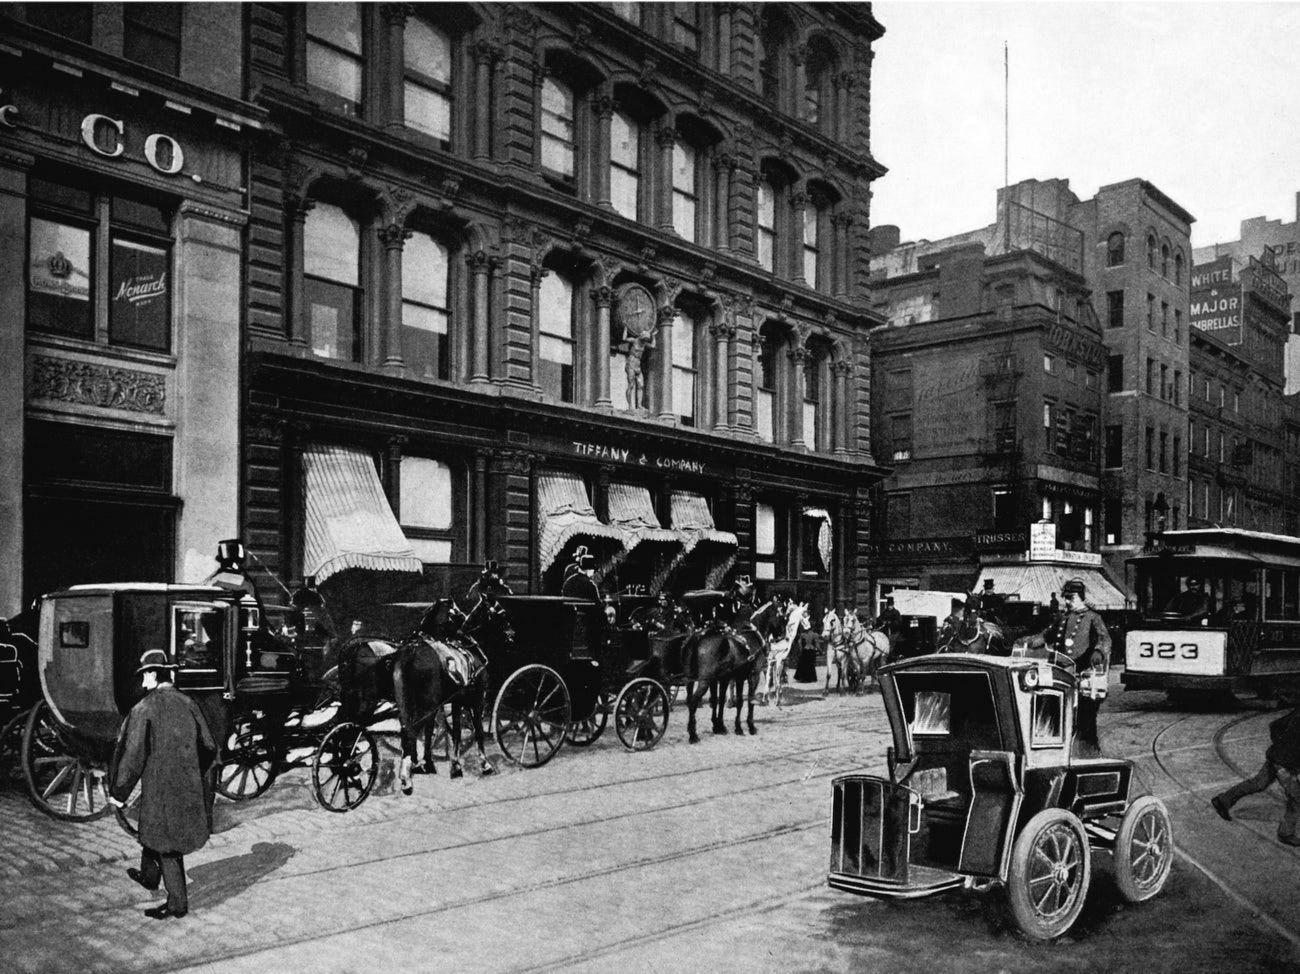 Tiffany & Co. in 1889